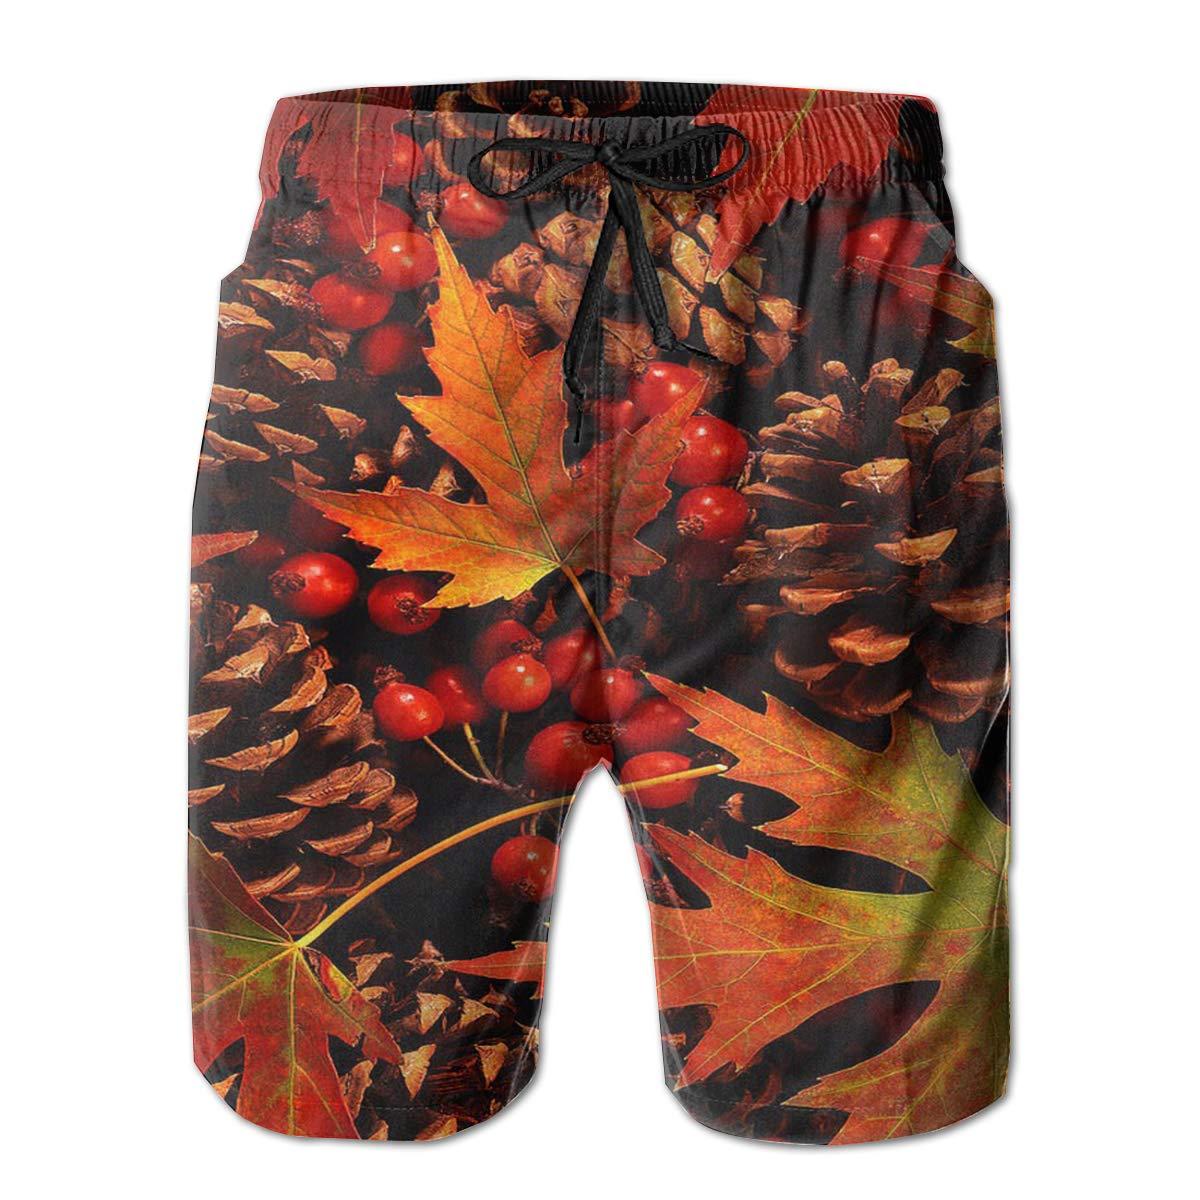 AMRANDOM Boys Board Shorts Fall Leaves Squirrel Quick Dry Swim Surf Trunks